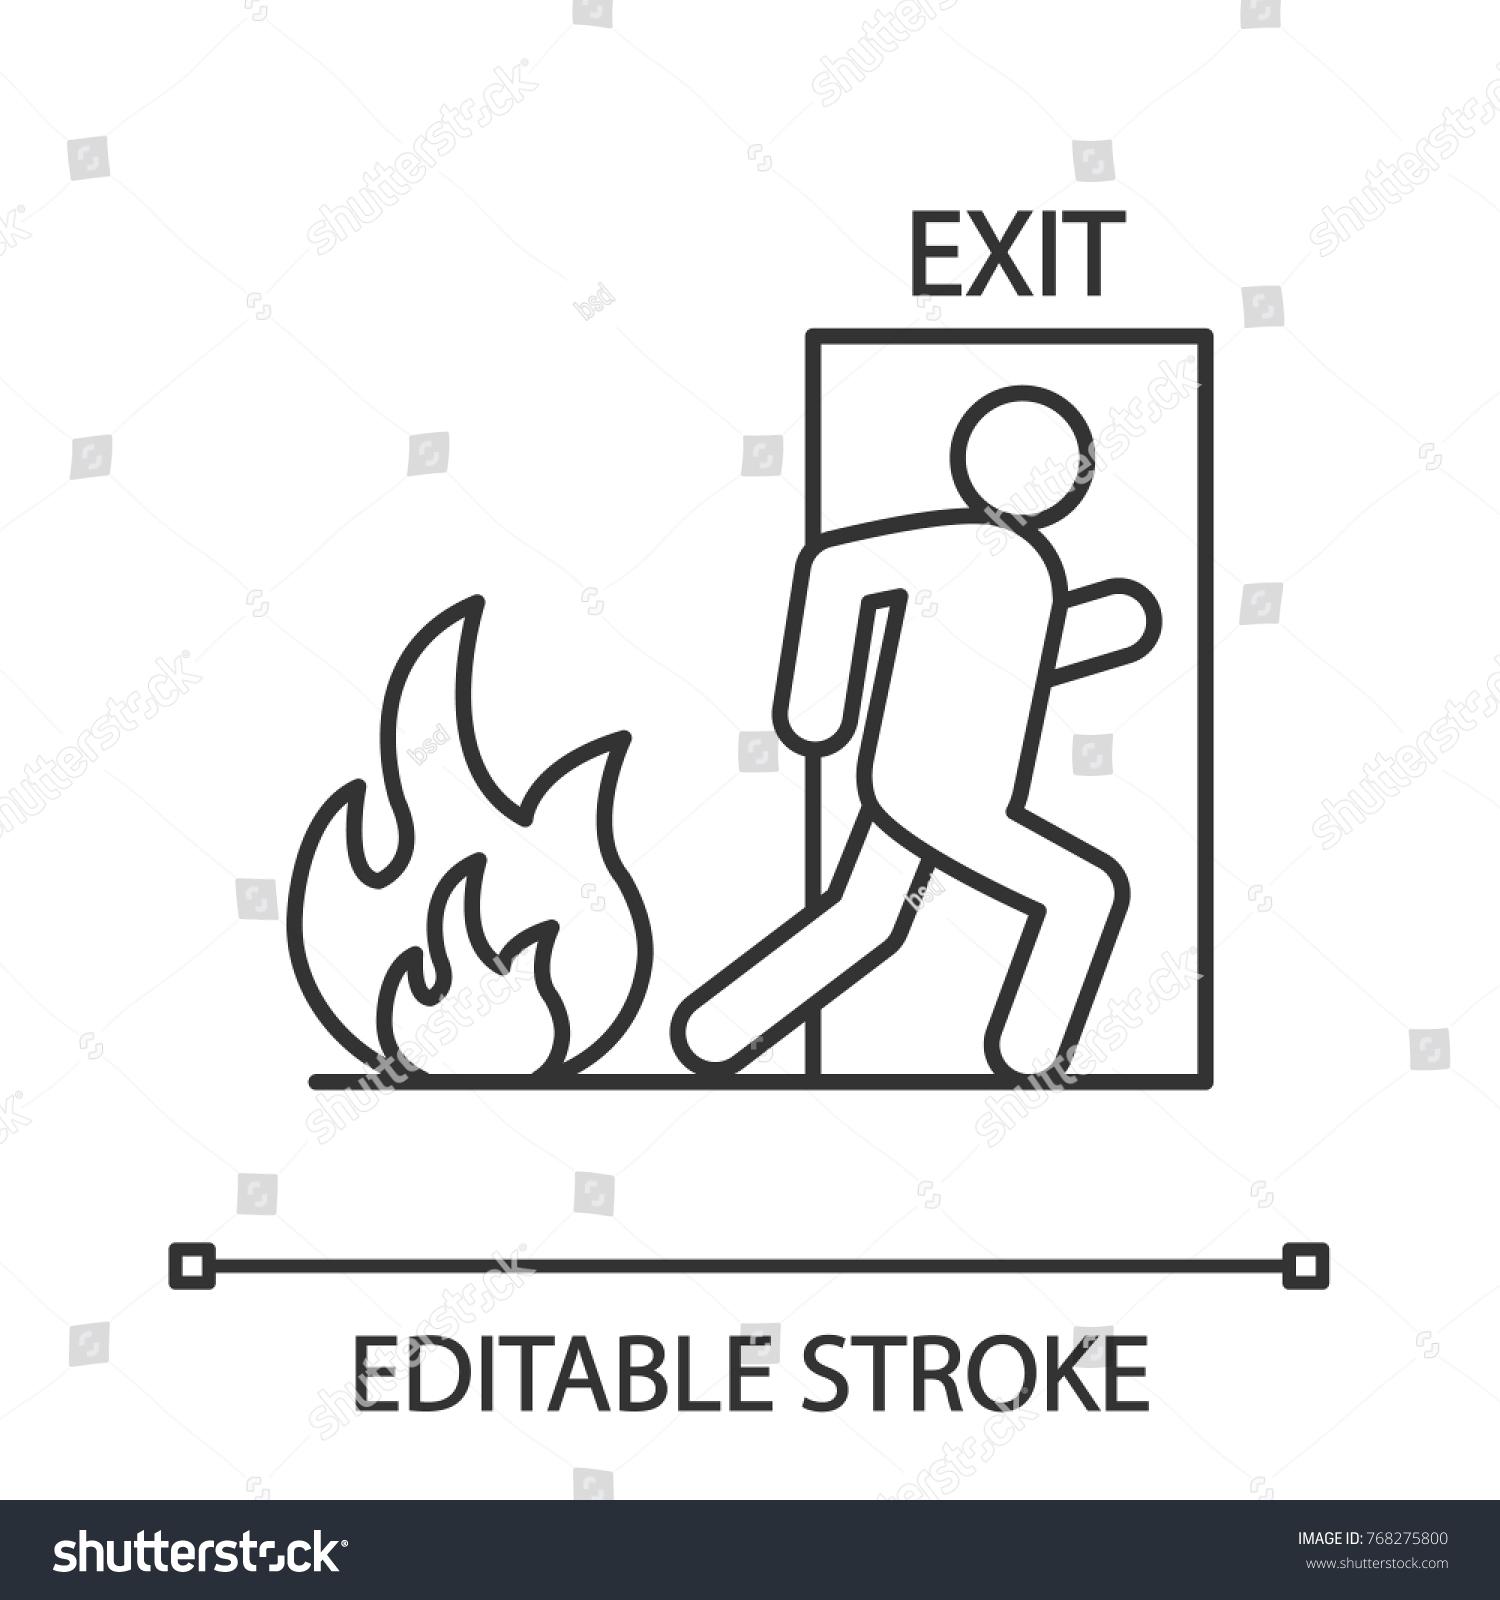 Fire Emergency Exit Door Human Linear Stock Vector Royalty Free